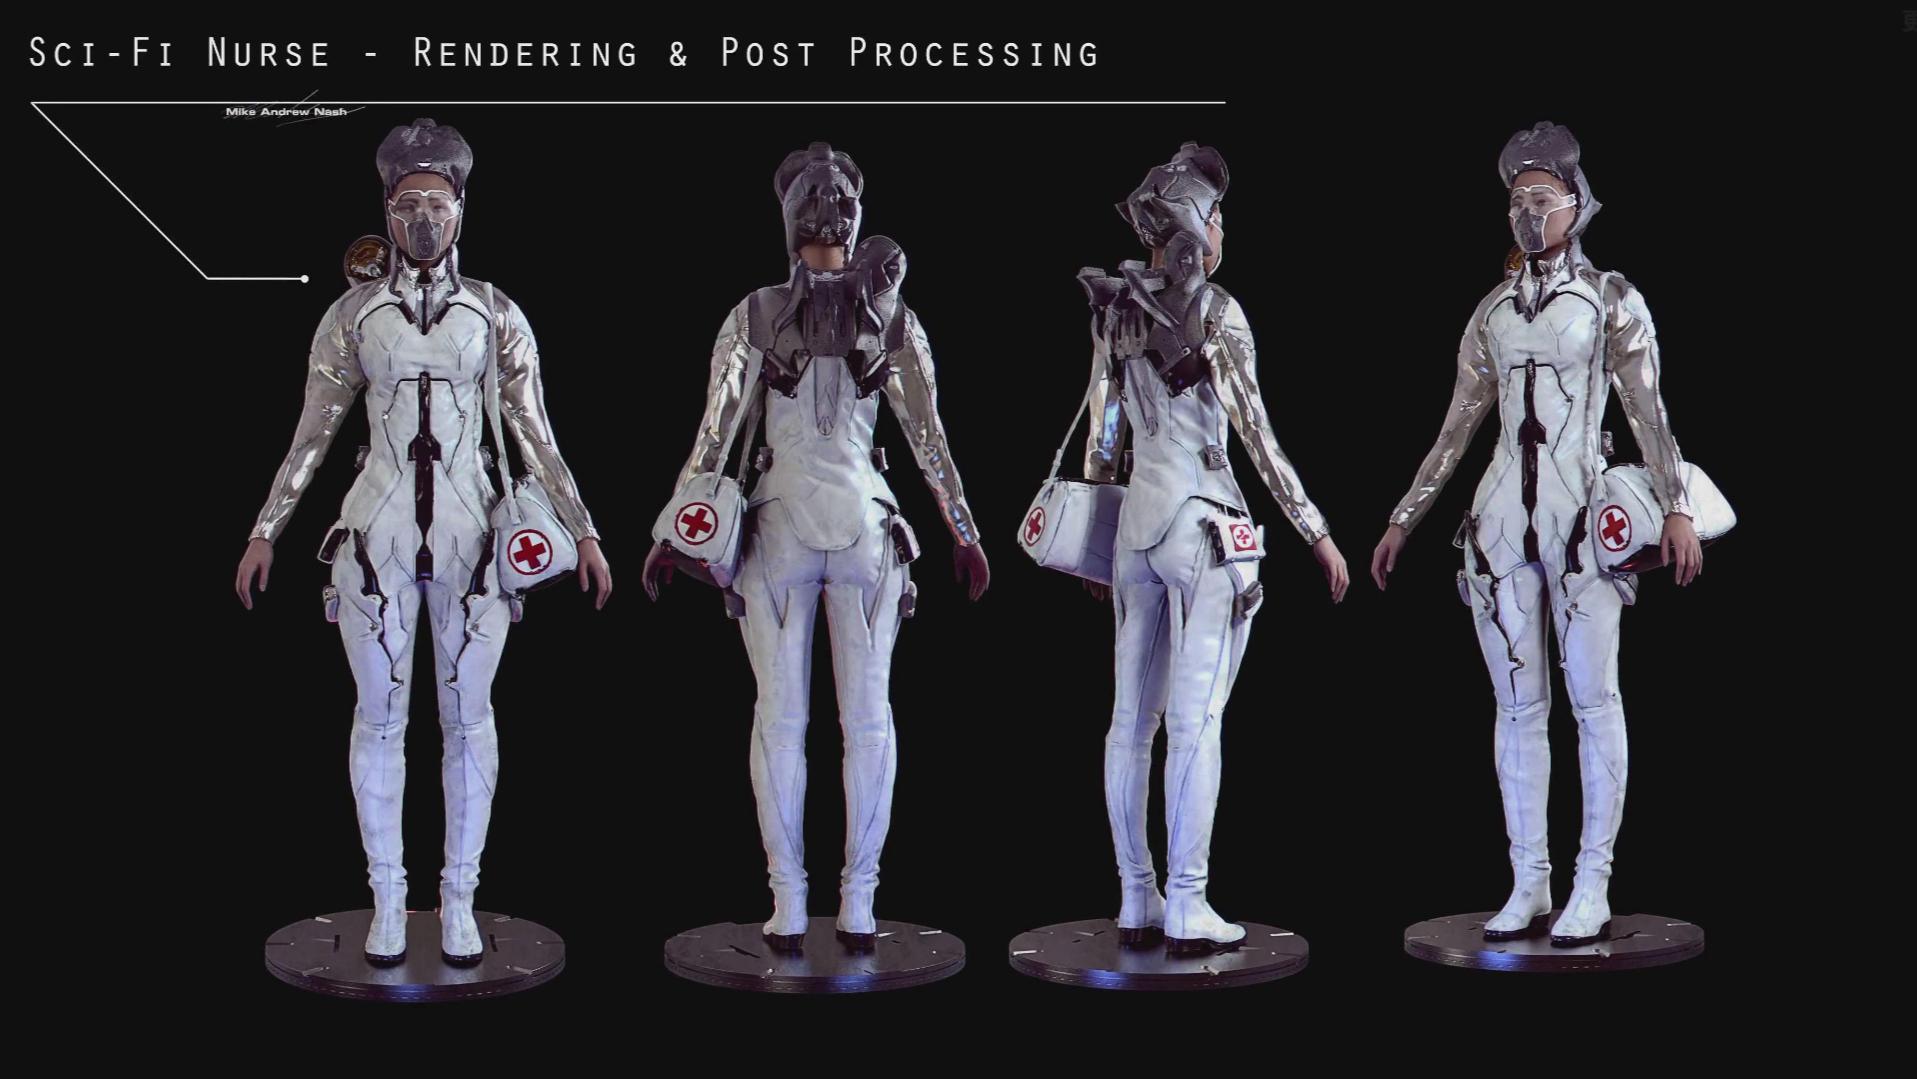 【ZBrush】ZBrush概念科幻护士雕刻渲染训练教程(中英双字)